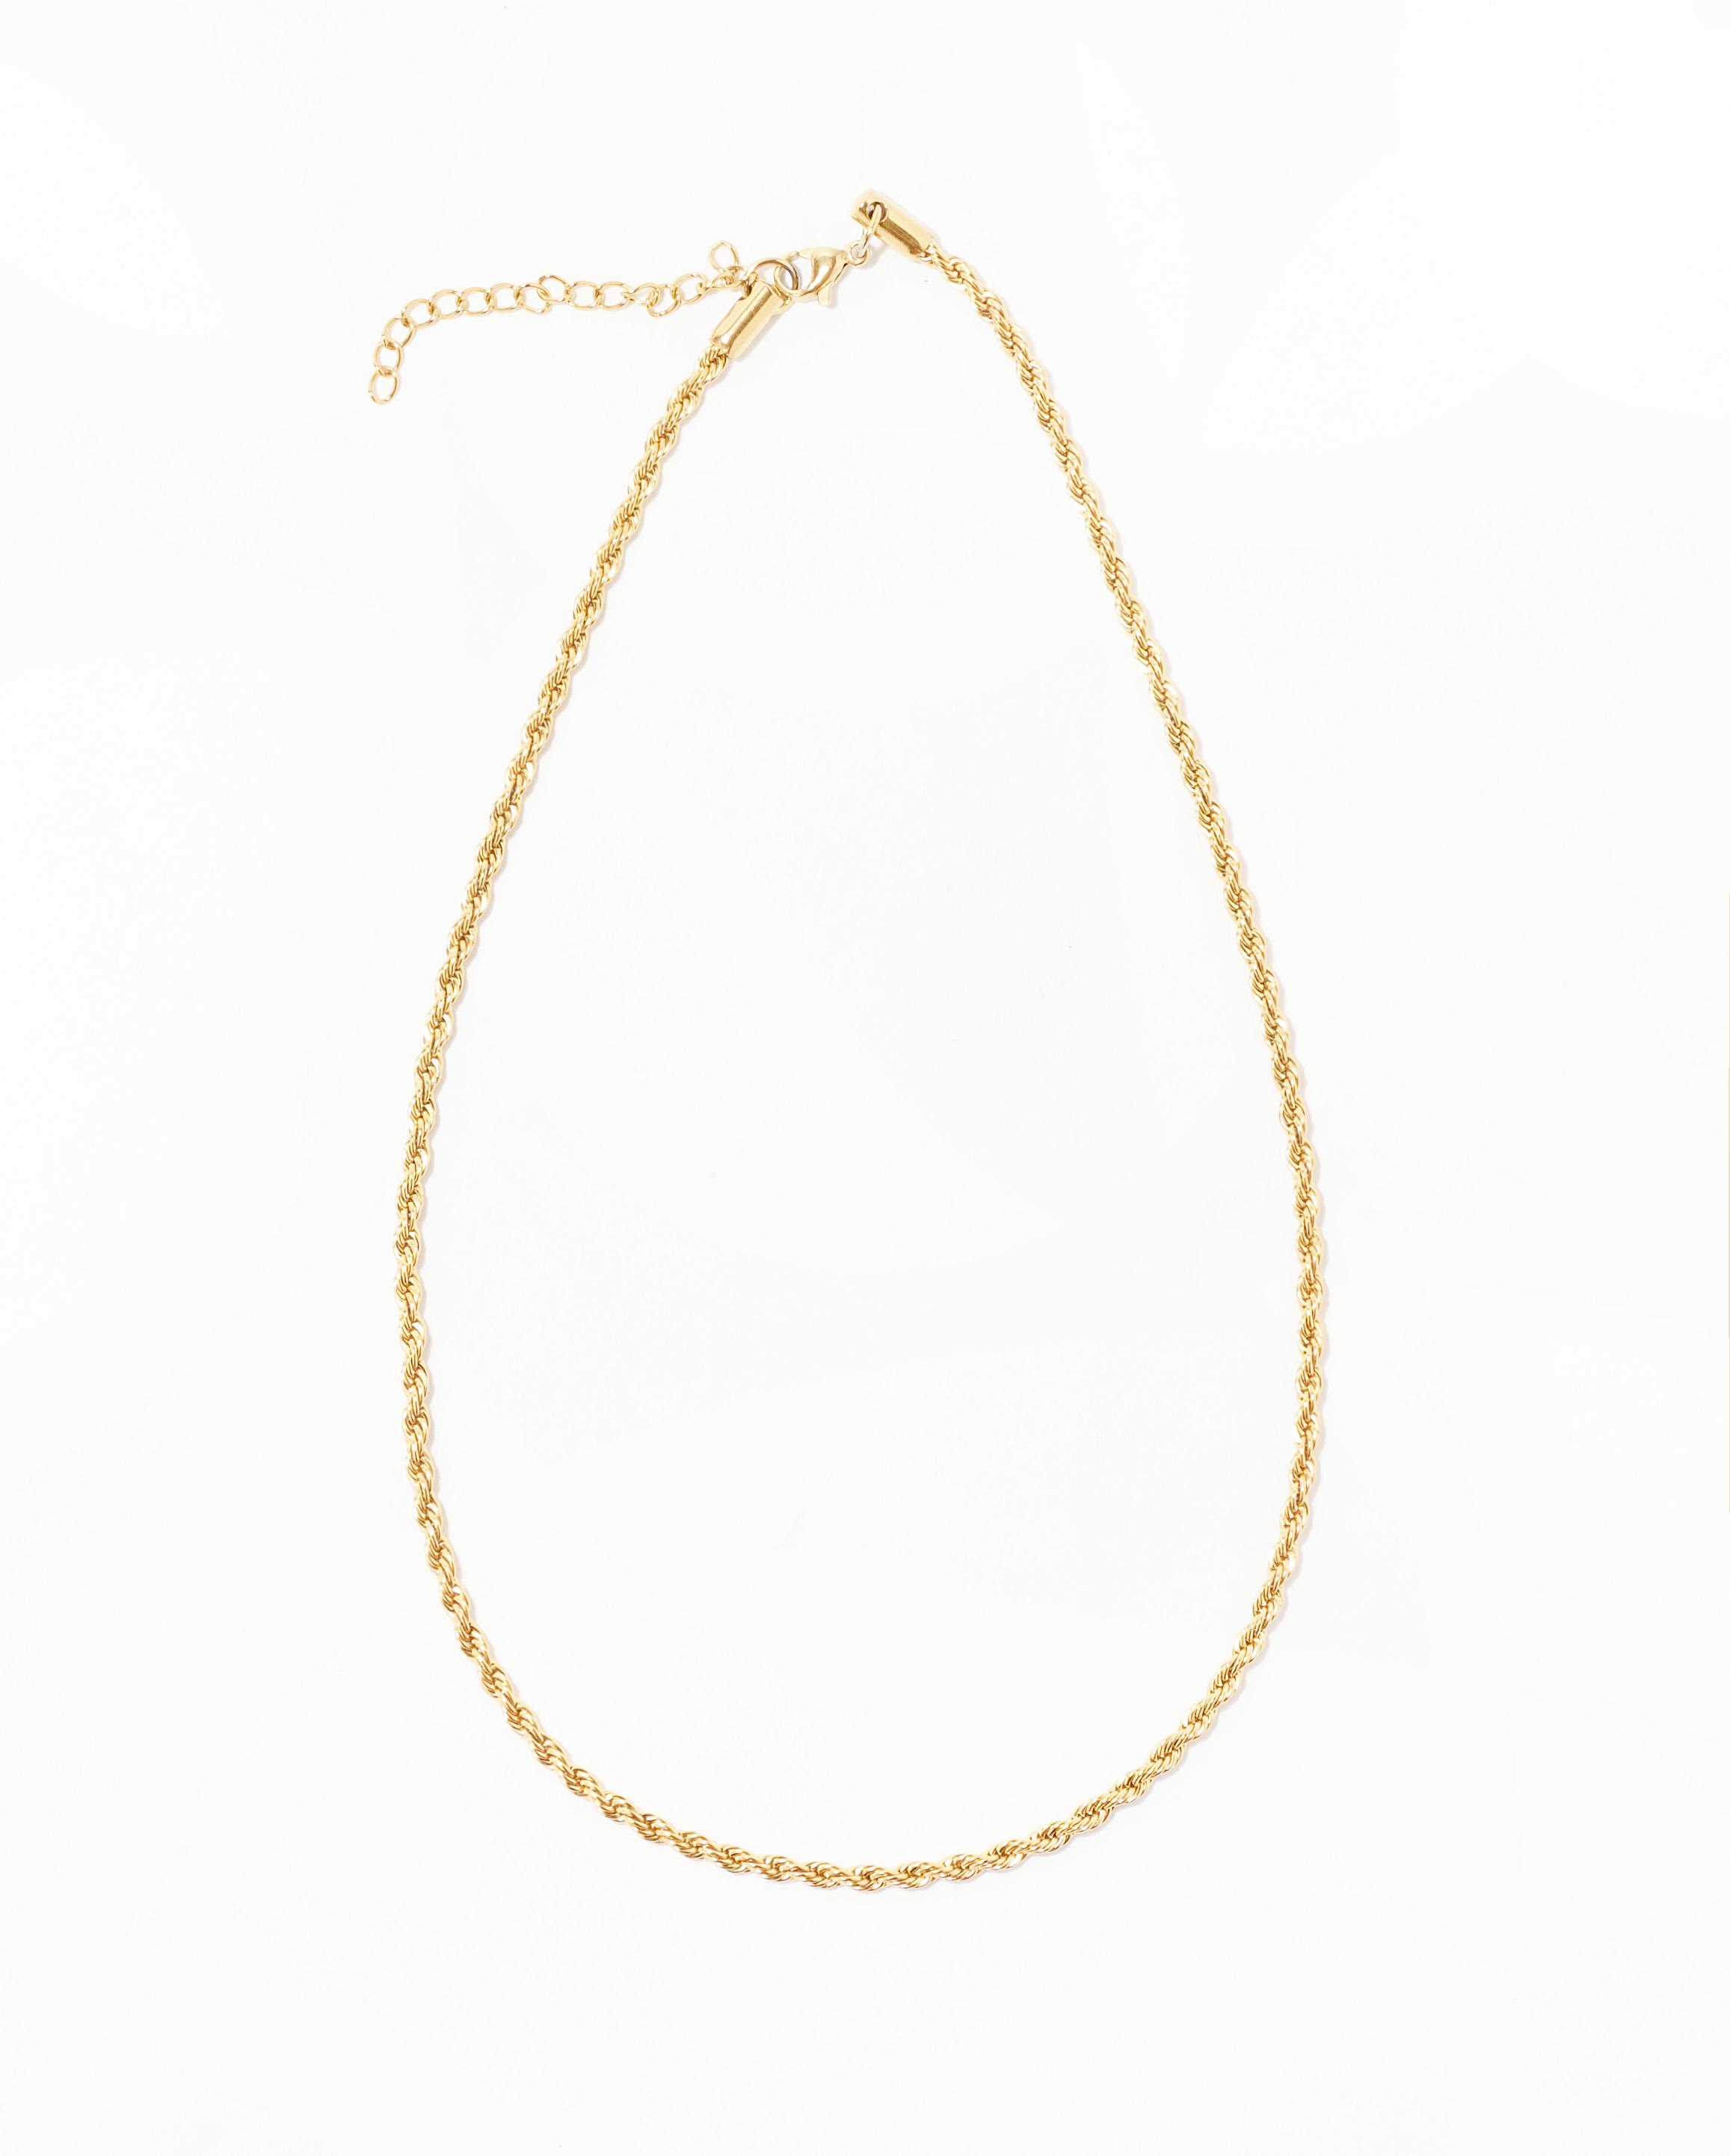 Bijoux Femme - Collier Or Jina - Nl91196